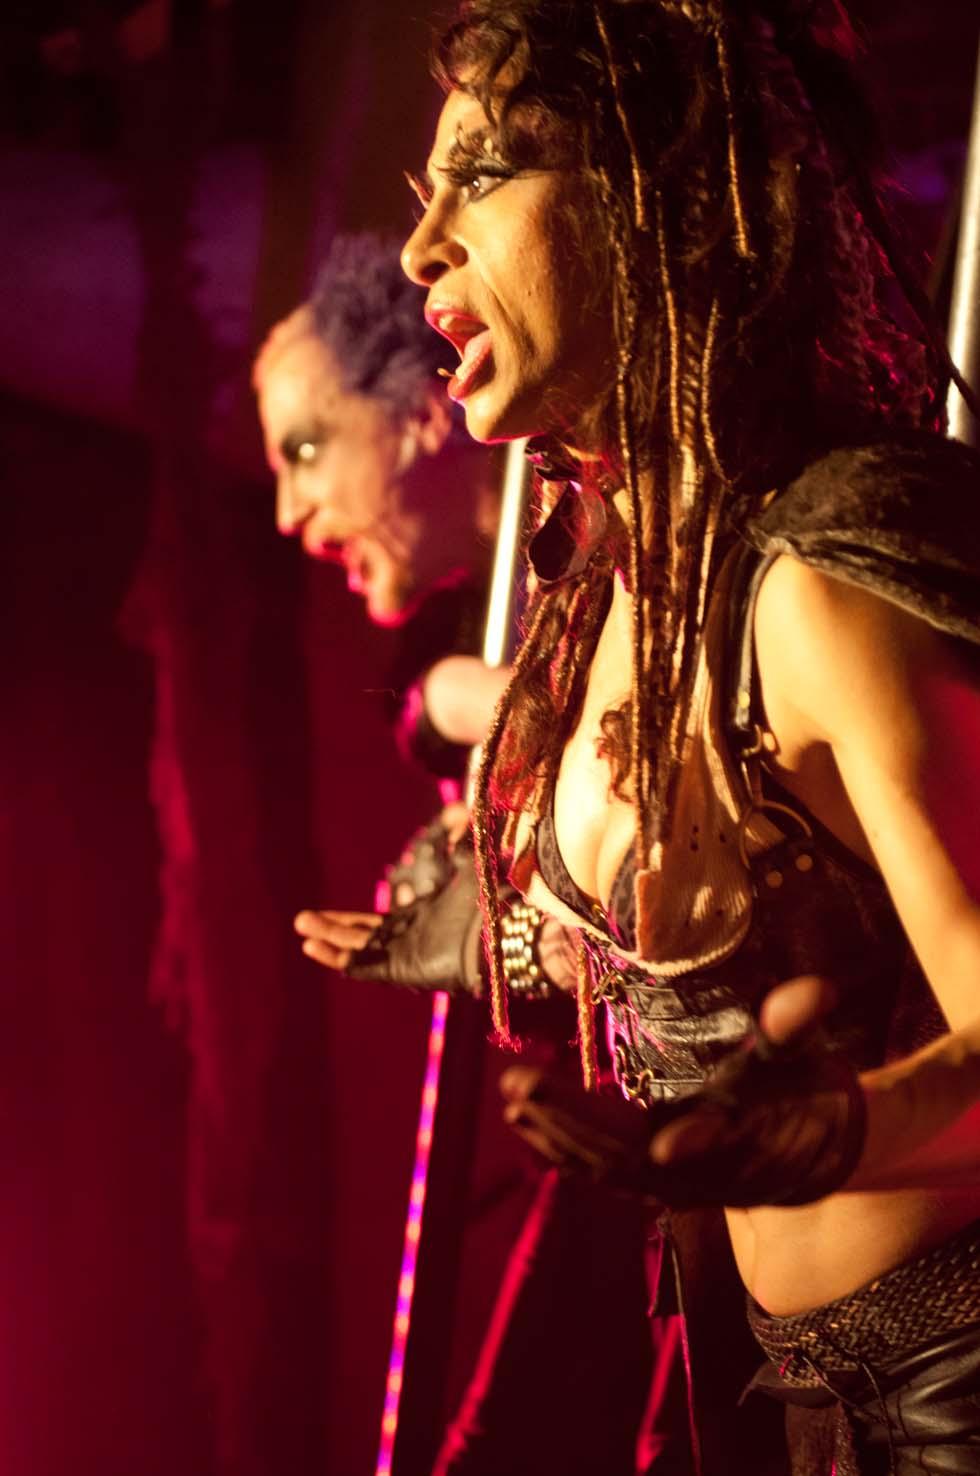 zum-schneider-nyc-2012-karneval-apocalyptika-5326.jpg